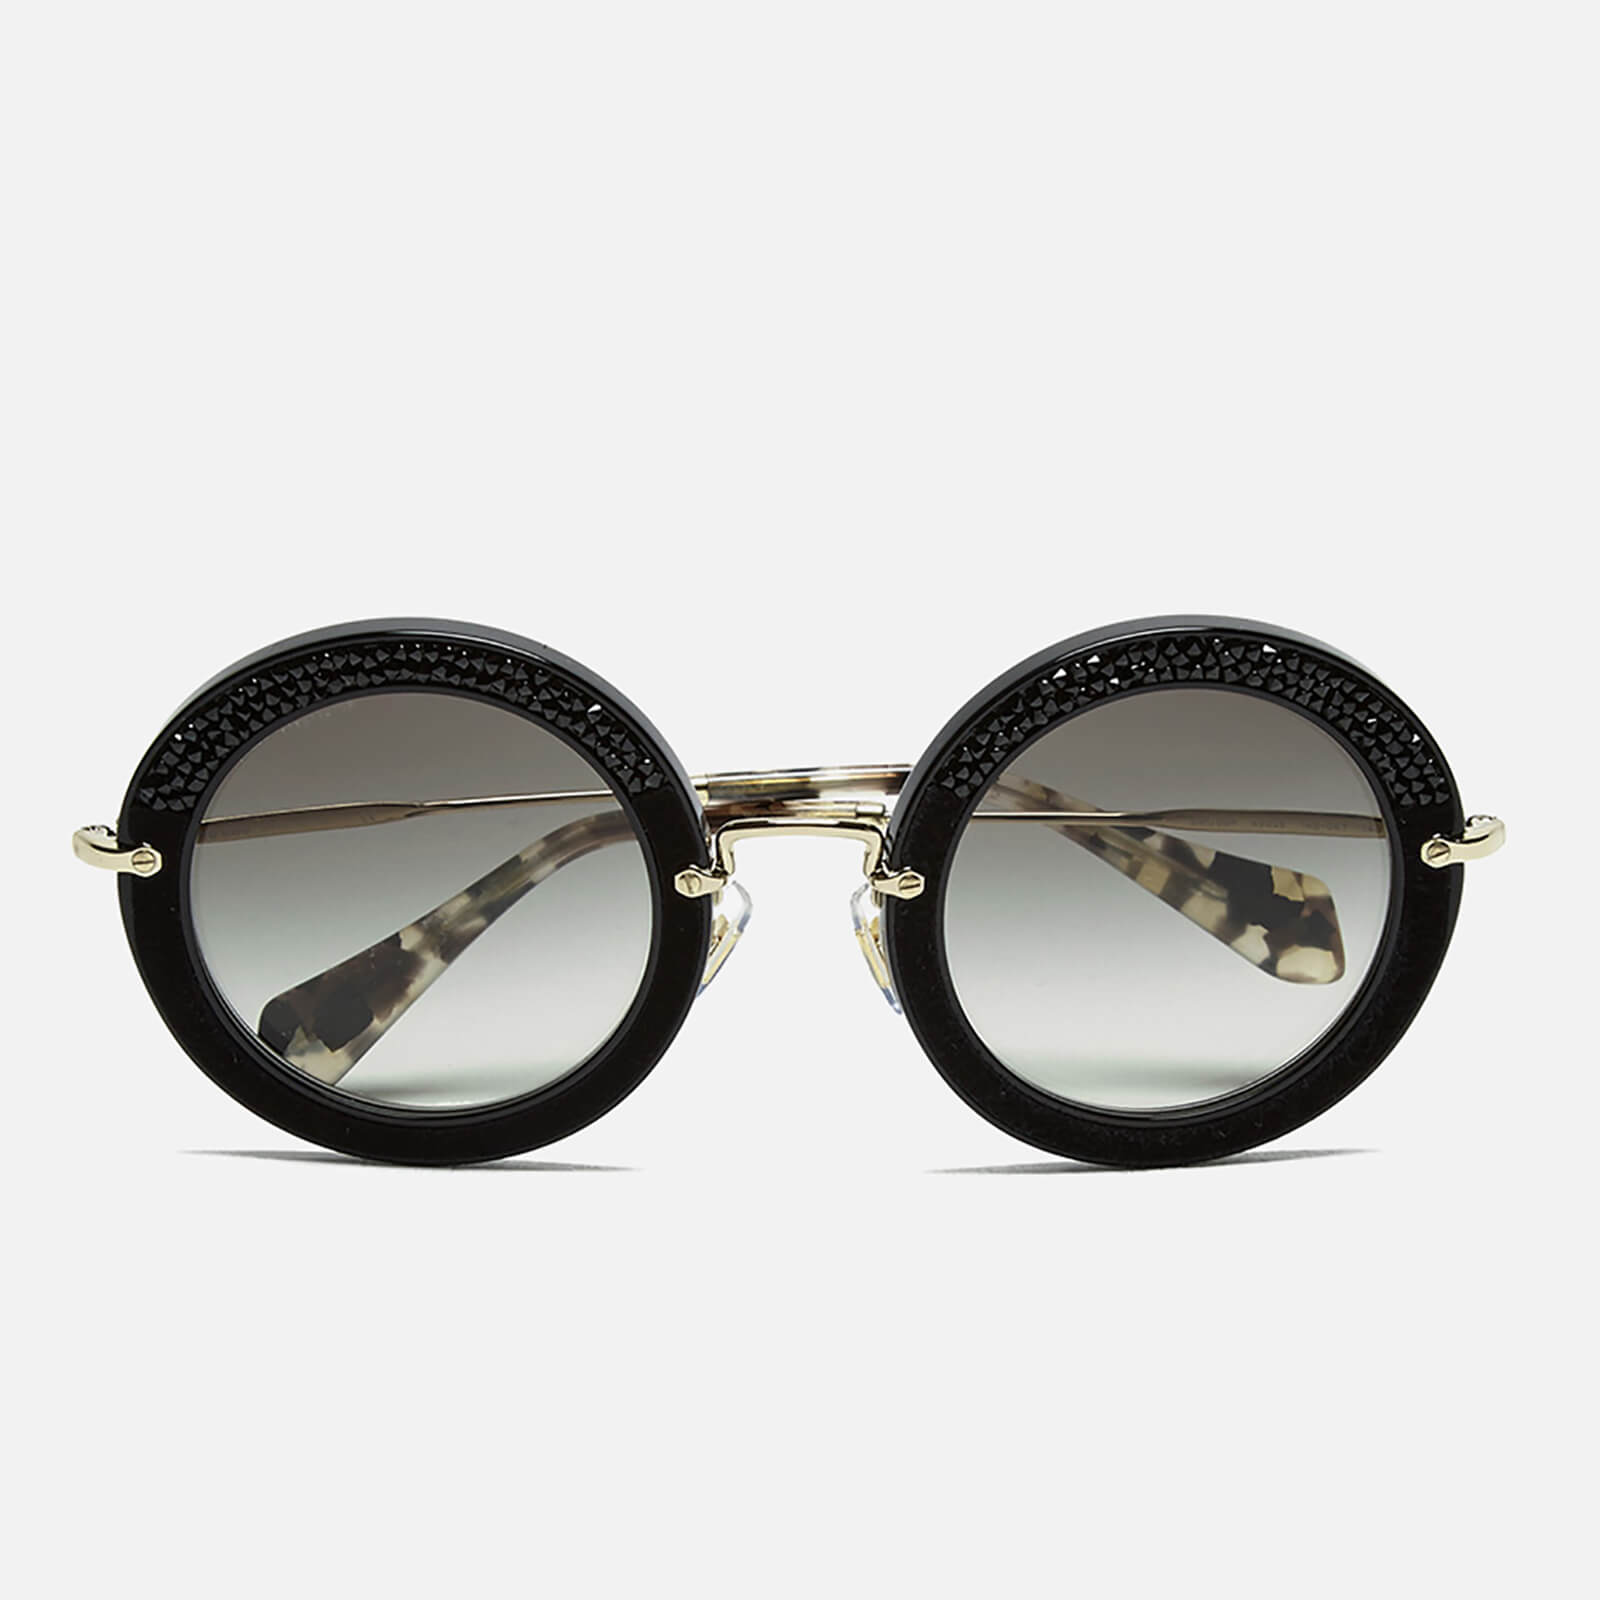 9da19d687a35 Miu Miu Women s Round Crystal Sunglasses - Black - Free UK Delivery over £50